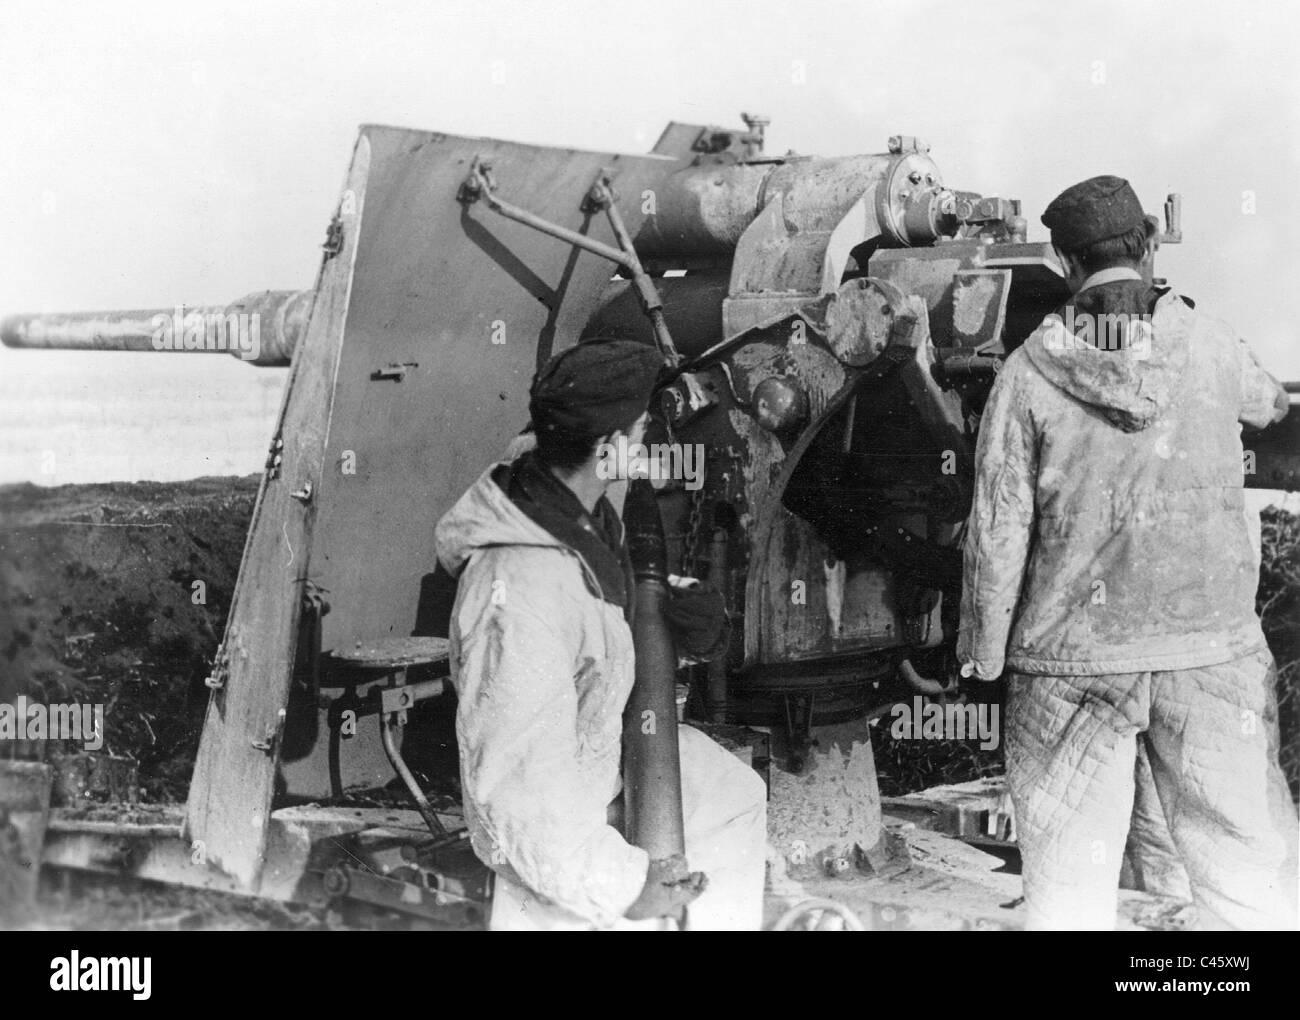 German anti-aircraft gun in Hungary, 1945 - Stock Image